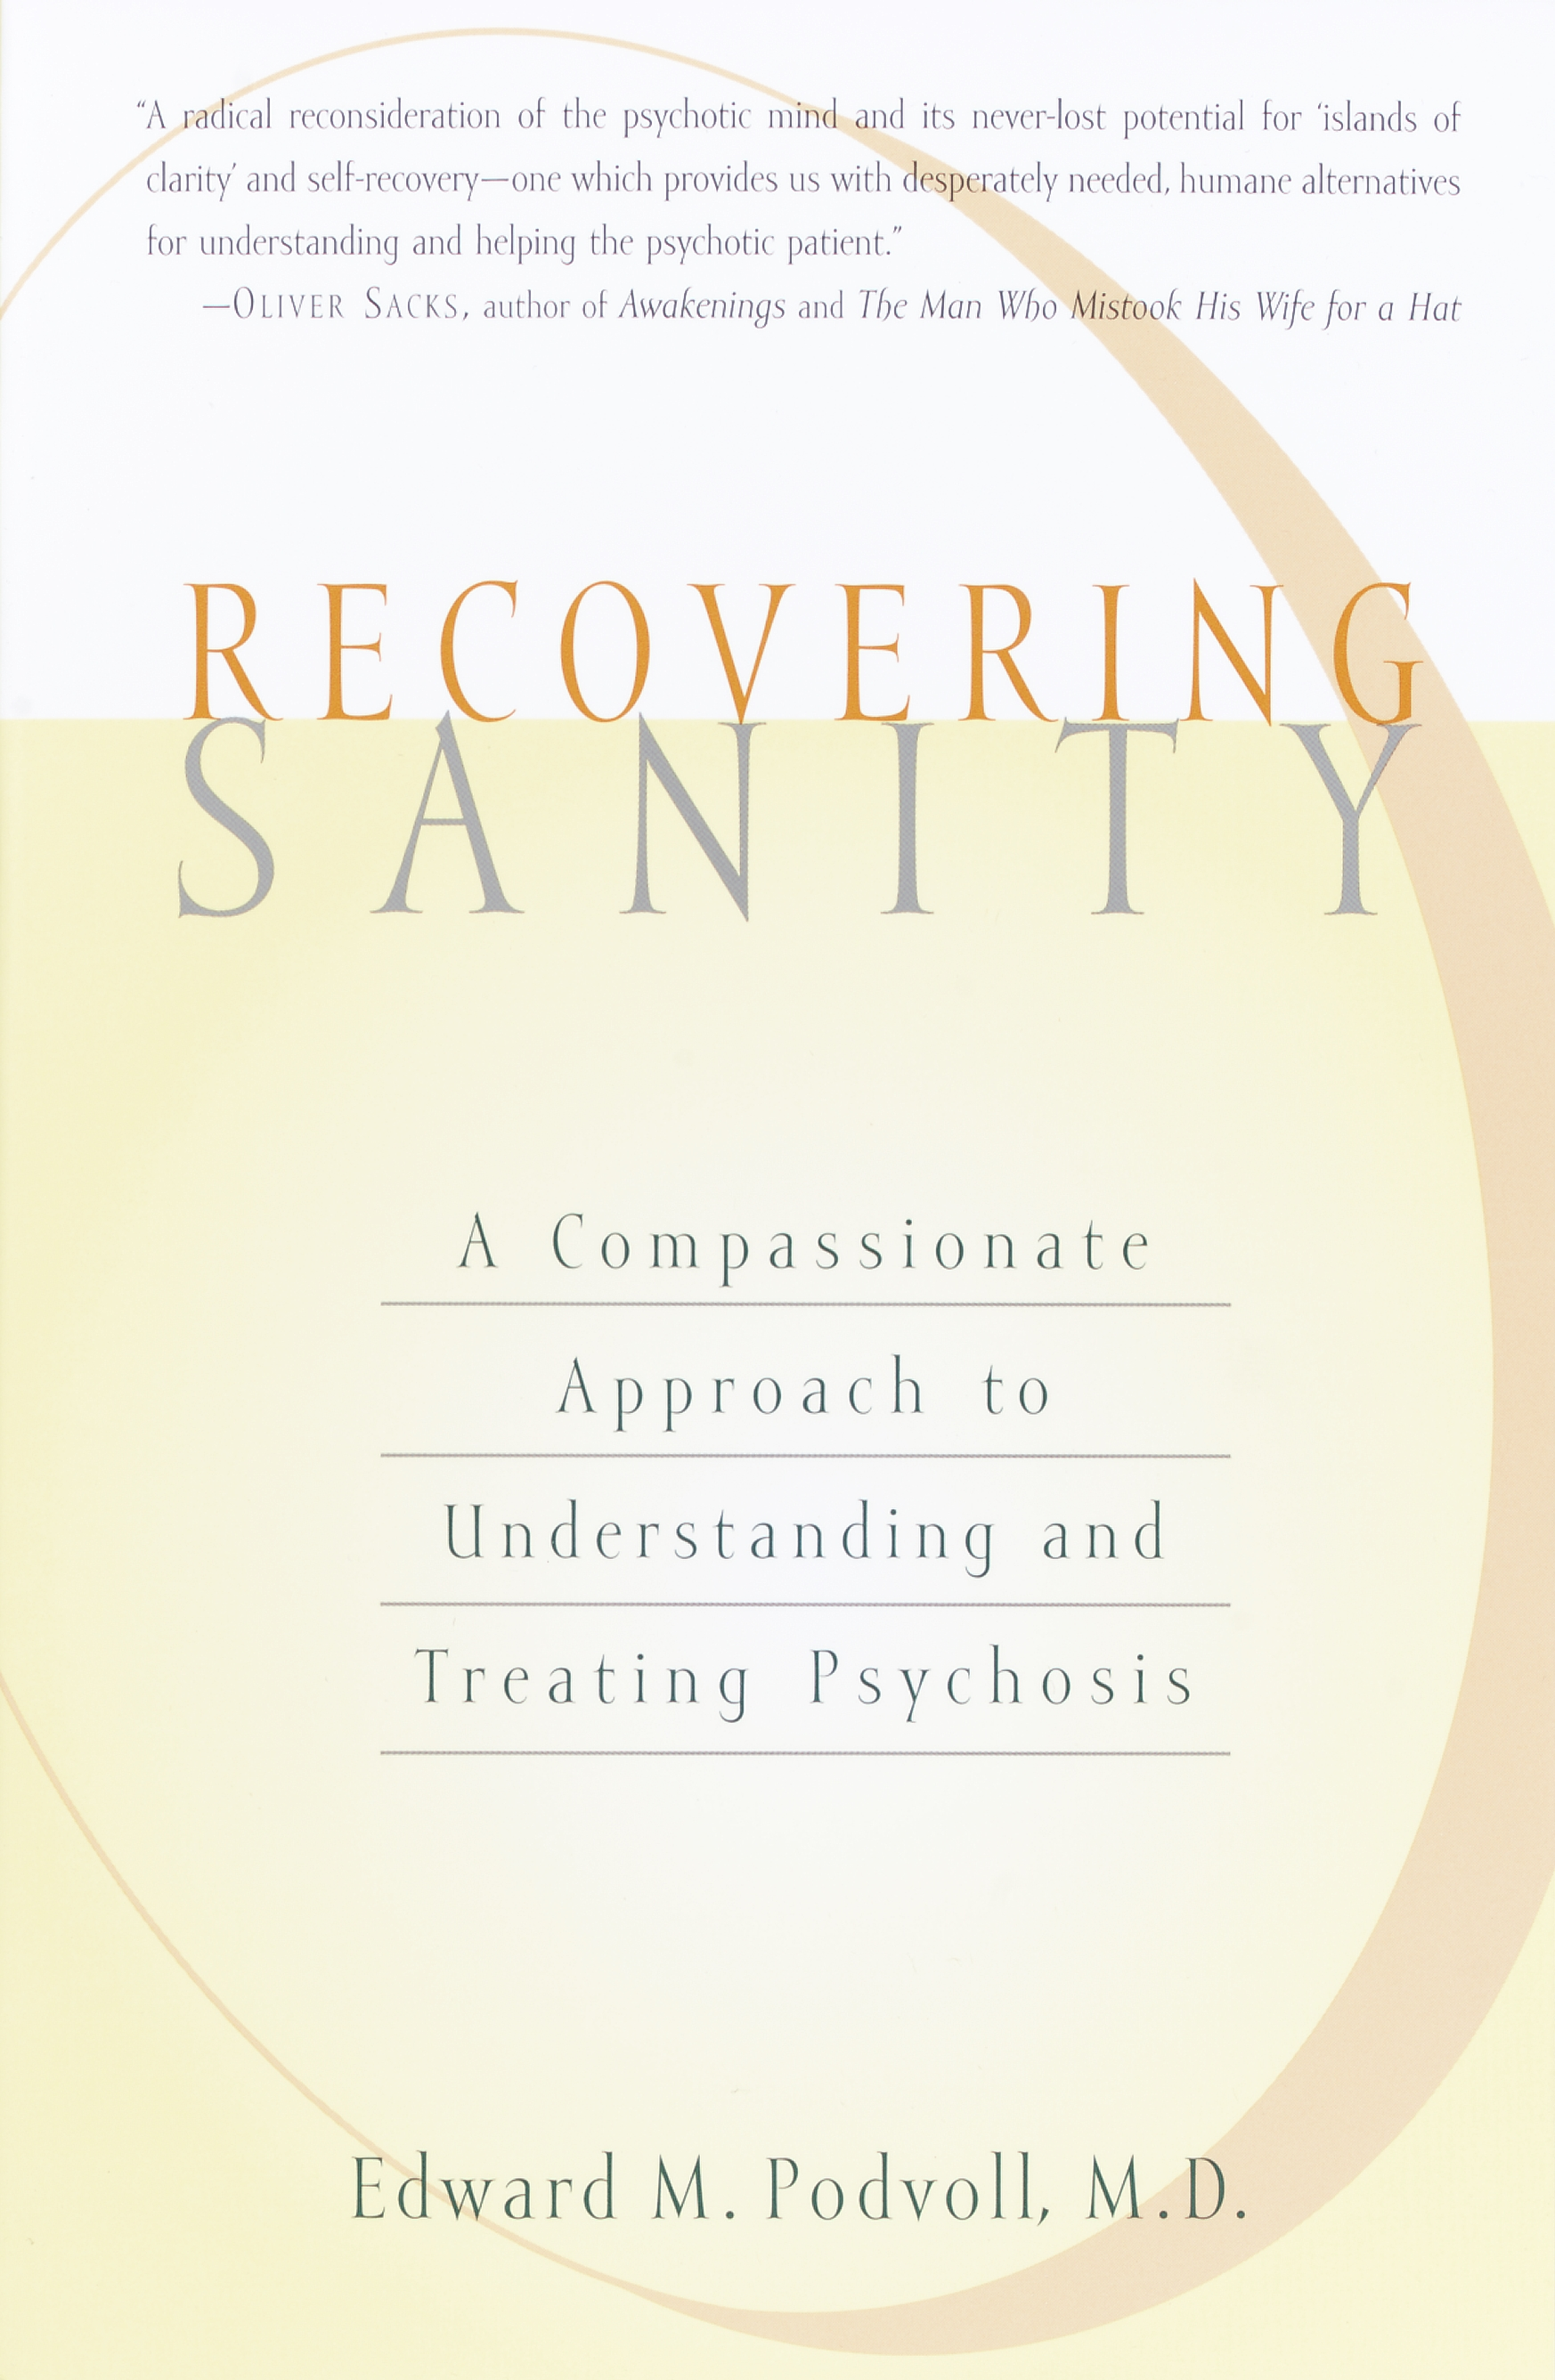 Recovering Sanity by Edward Podvoll - Penguin Books Australia